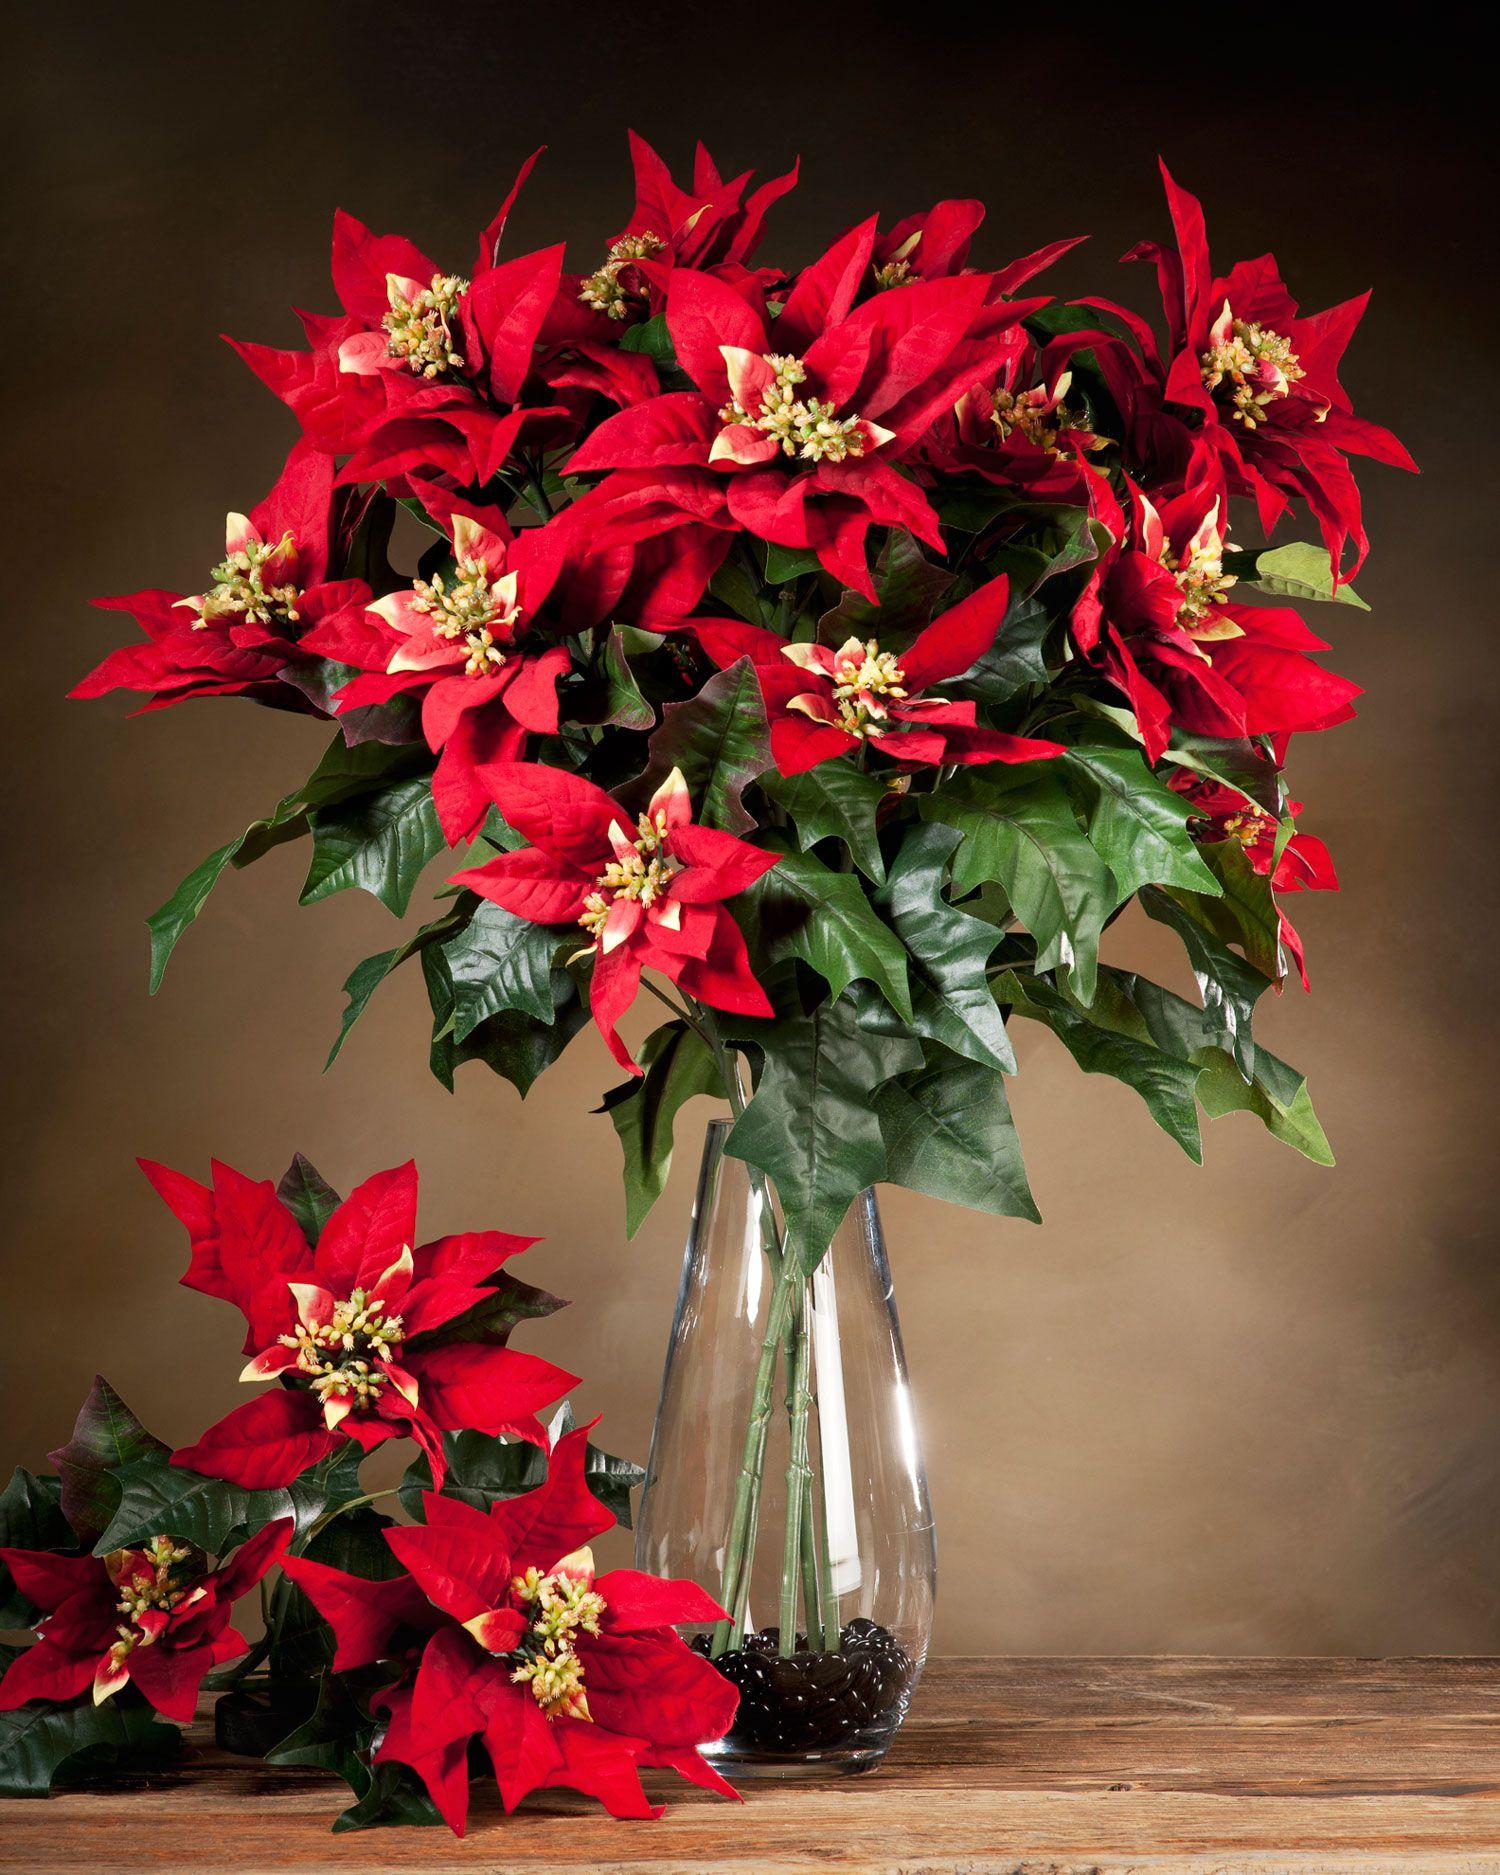 Poinsettia Silk Flower Stem Poinsettia Plant Flower Arrangements Elegant Christmas Decor